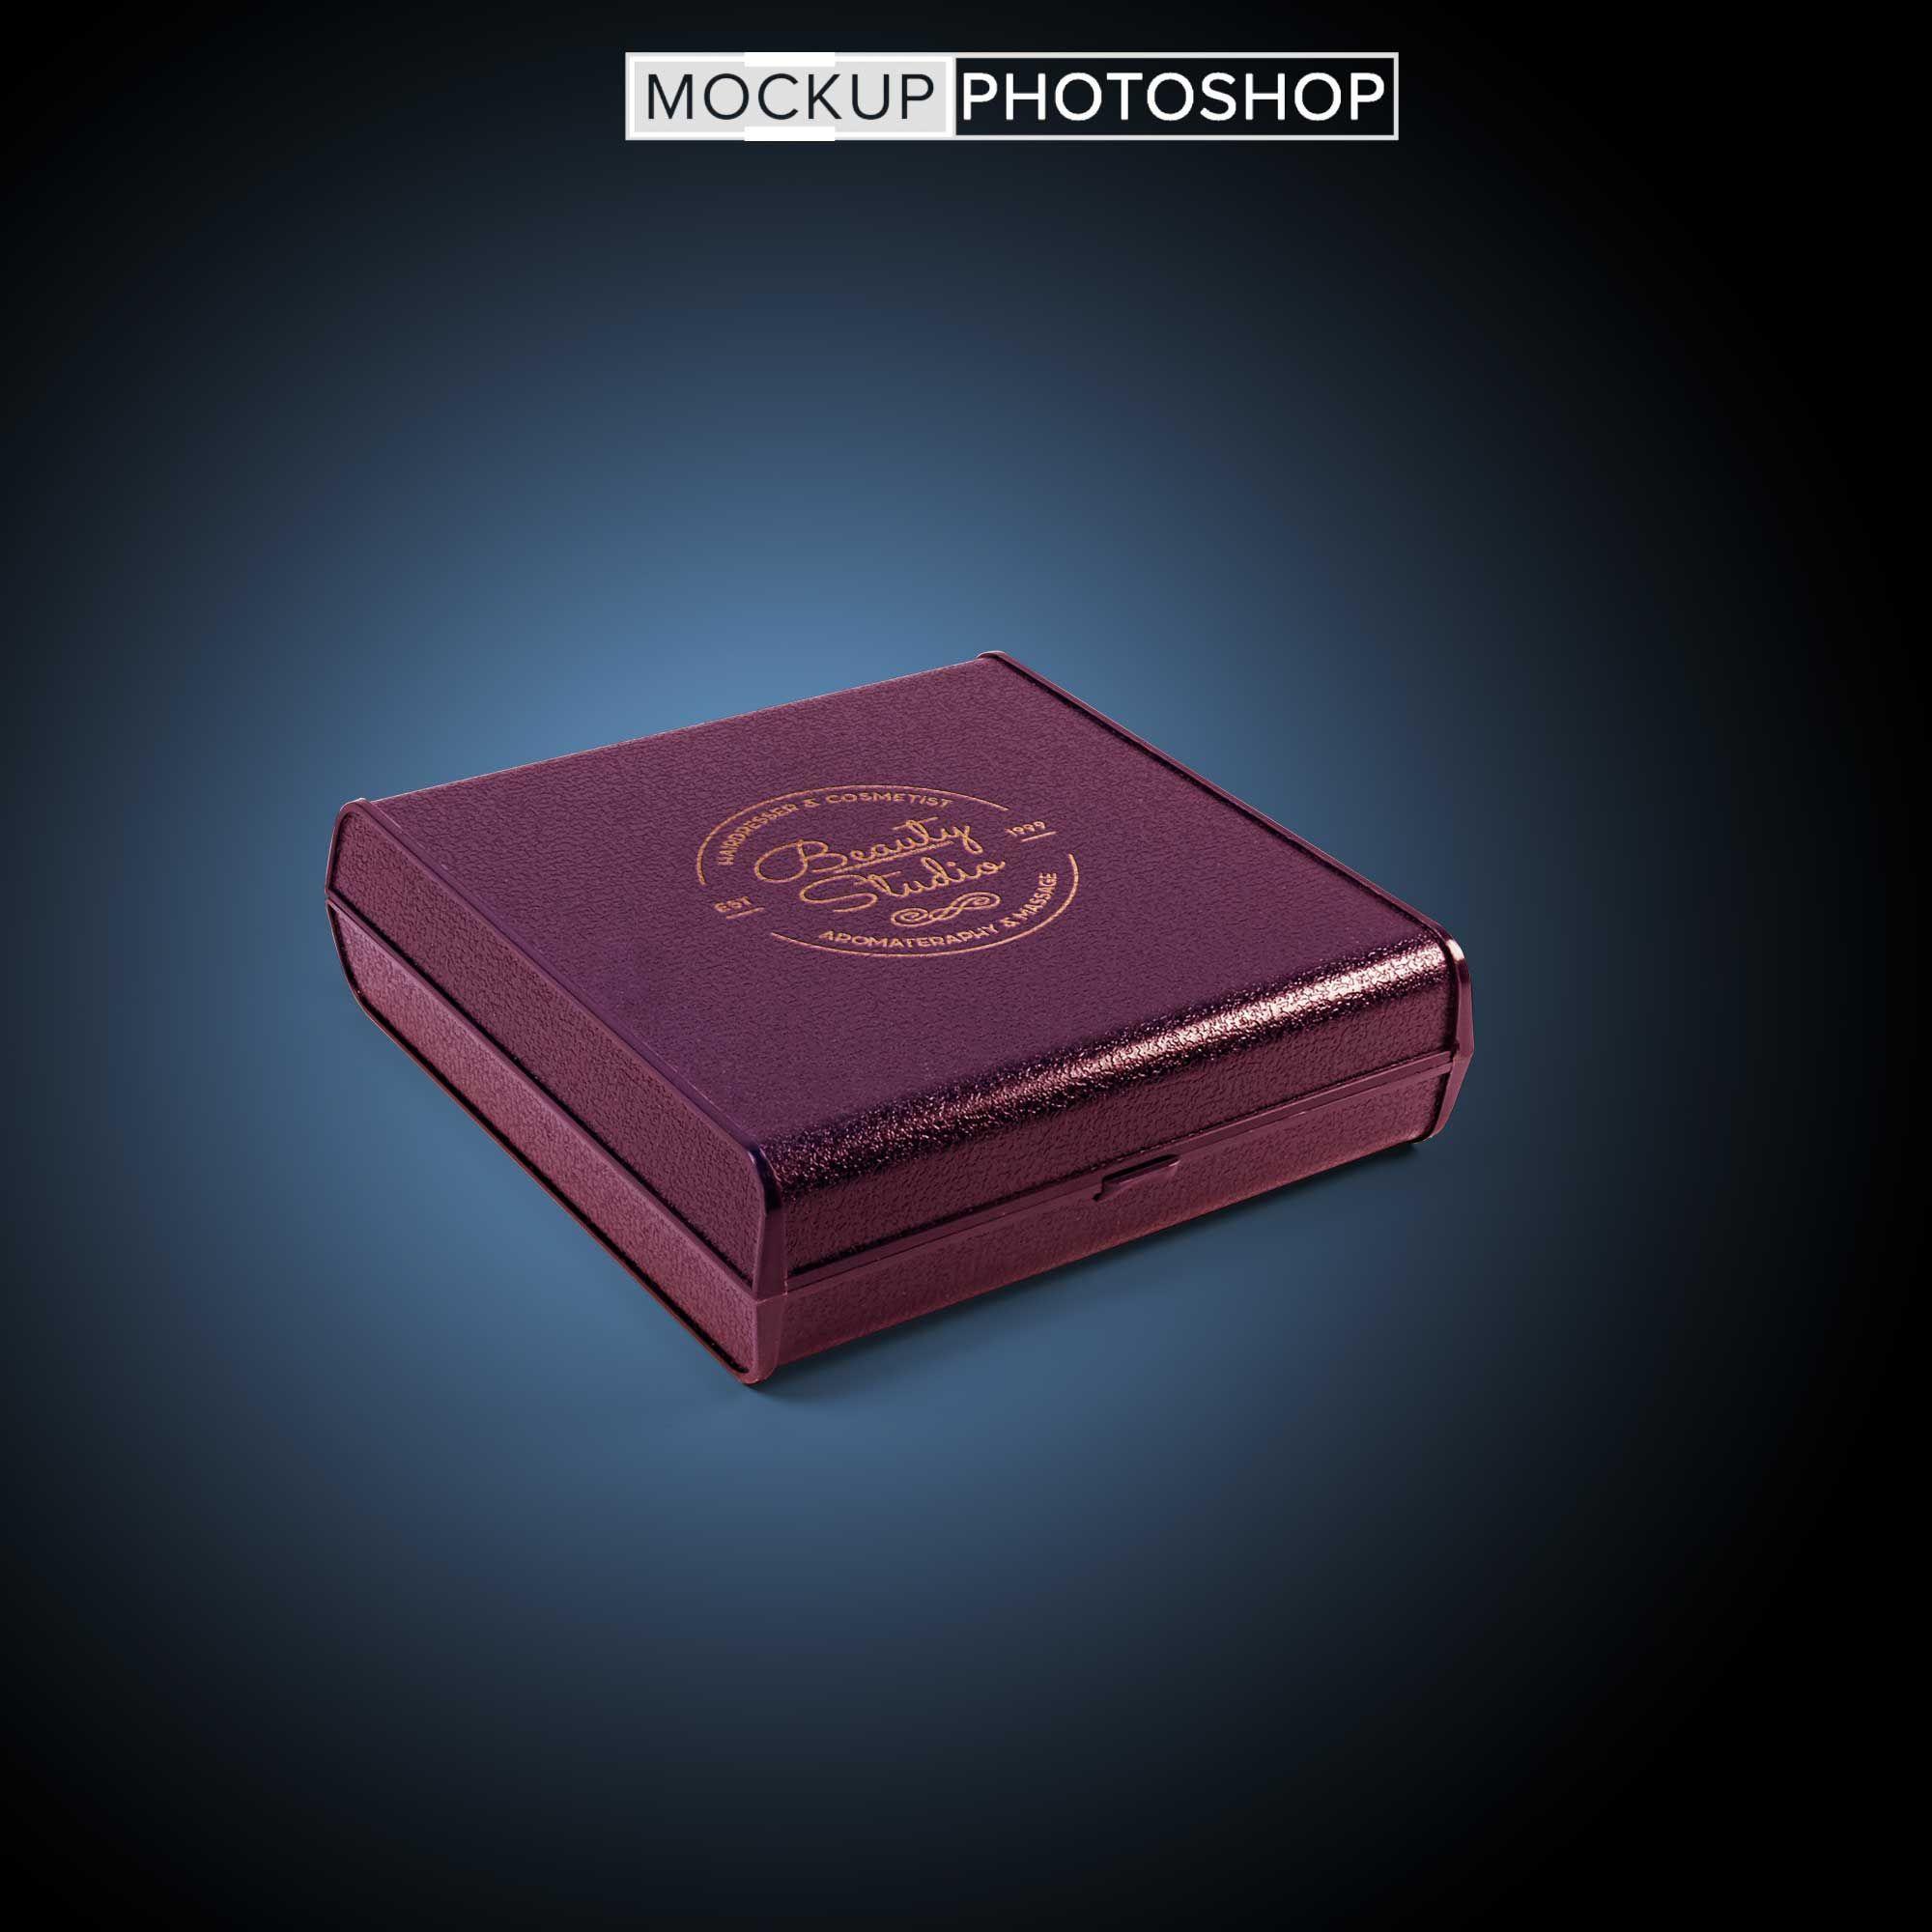 Download Premium Square Box Mockup Boxmockup Branding Download Downloadpsd Free Freemockup Freepsd Fre Mockup Free Download Free Logo Mockup Logo Design Mockup